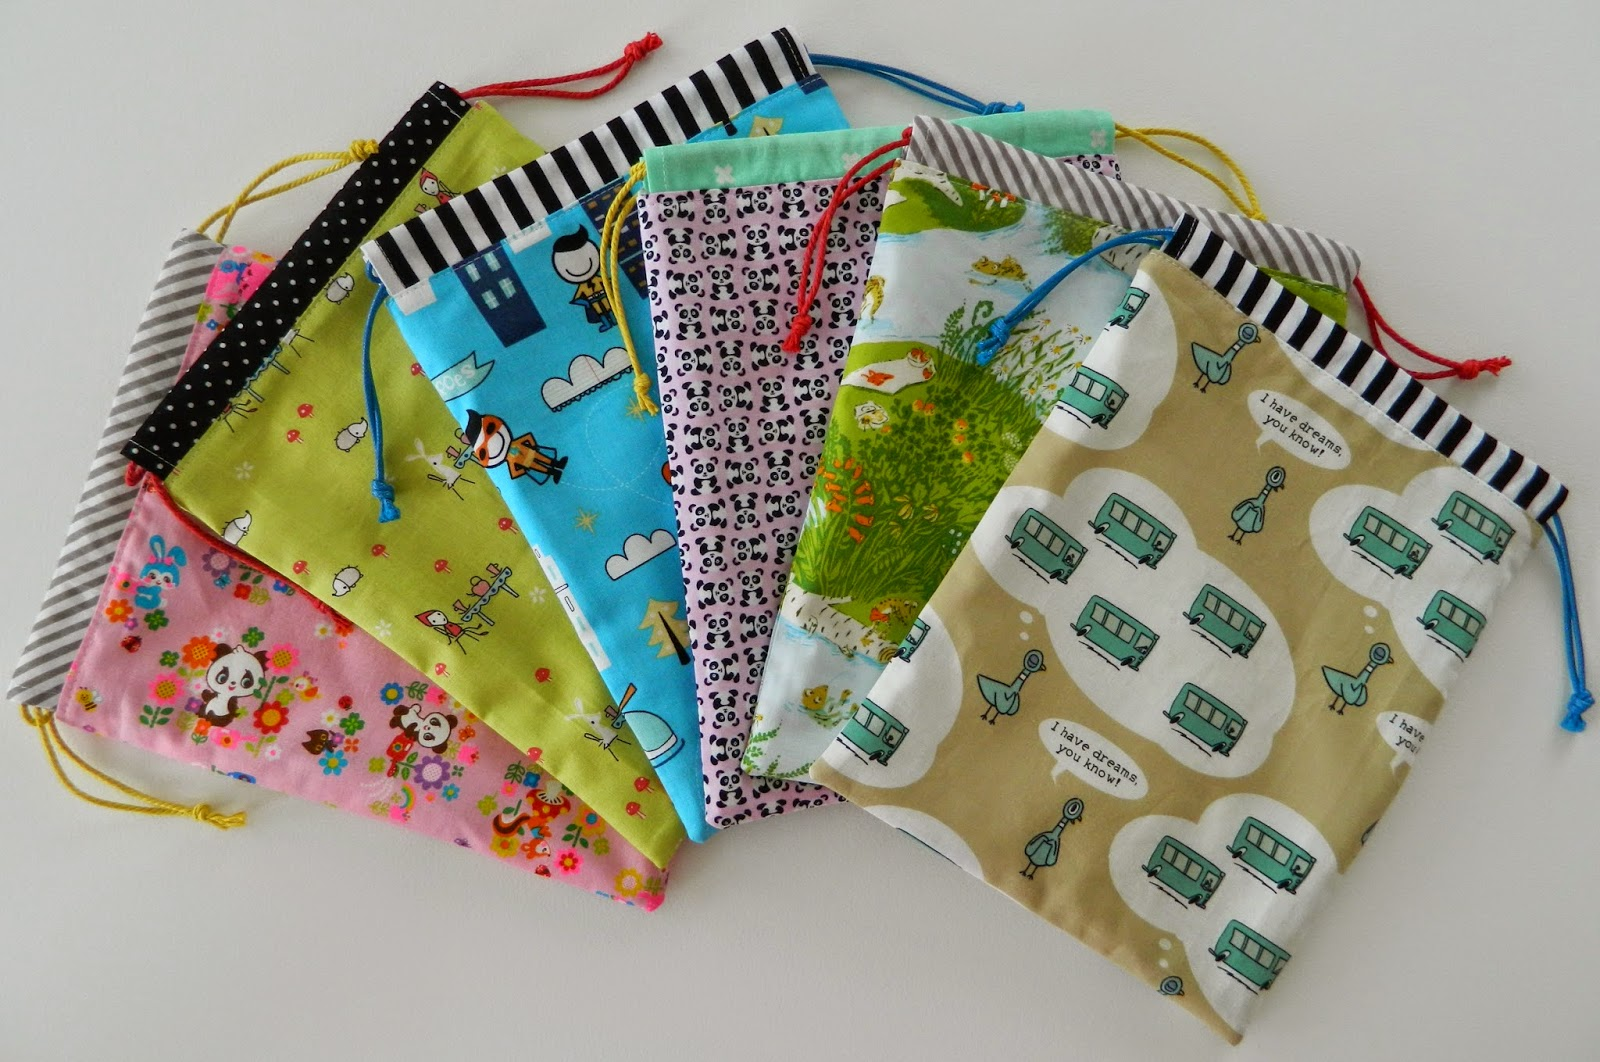 s.o.t.a.k handmade: drawstring bags